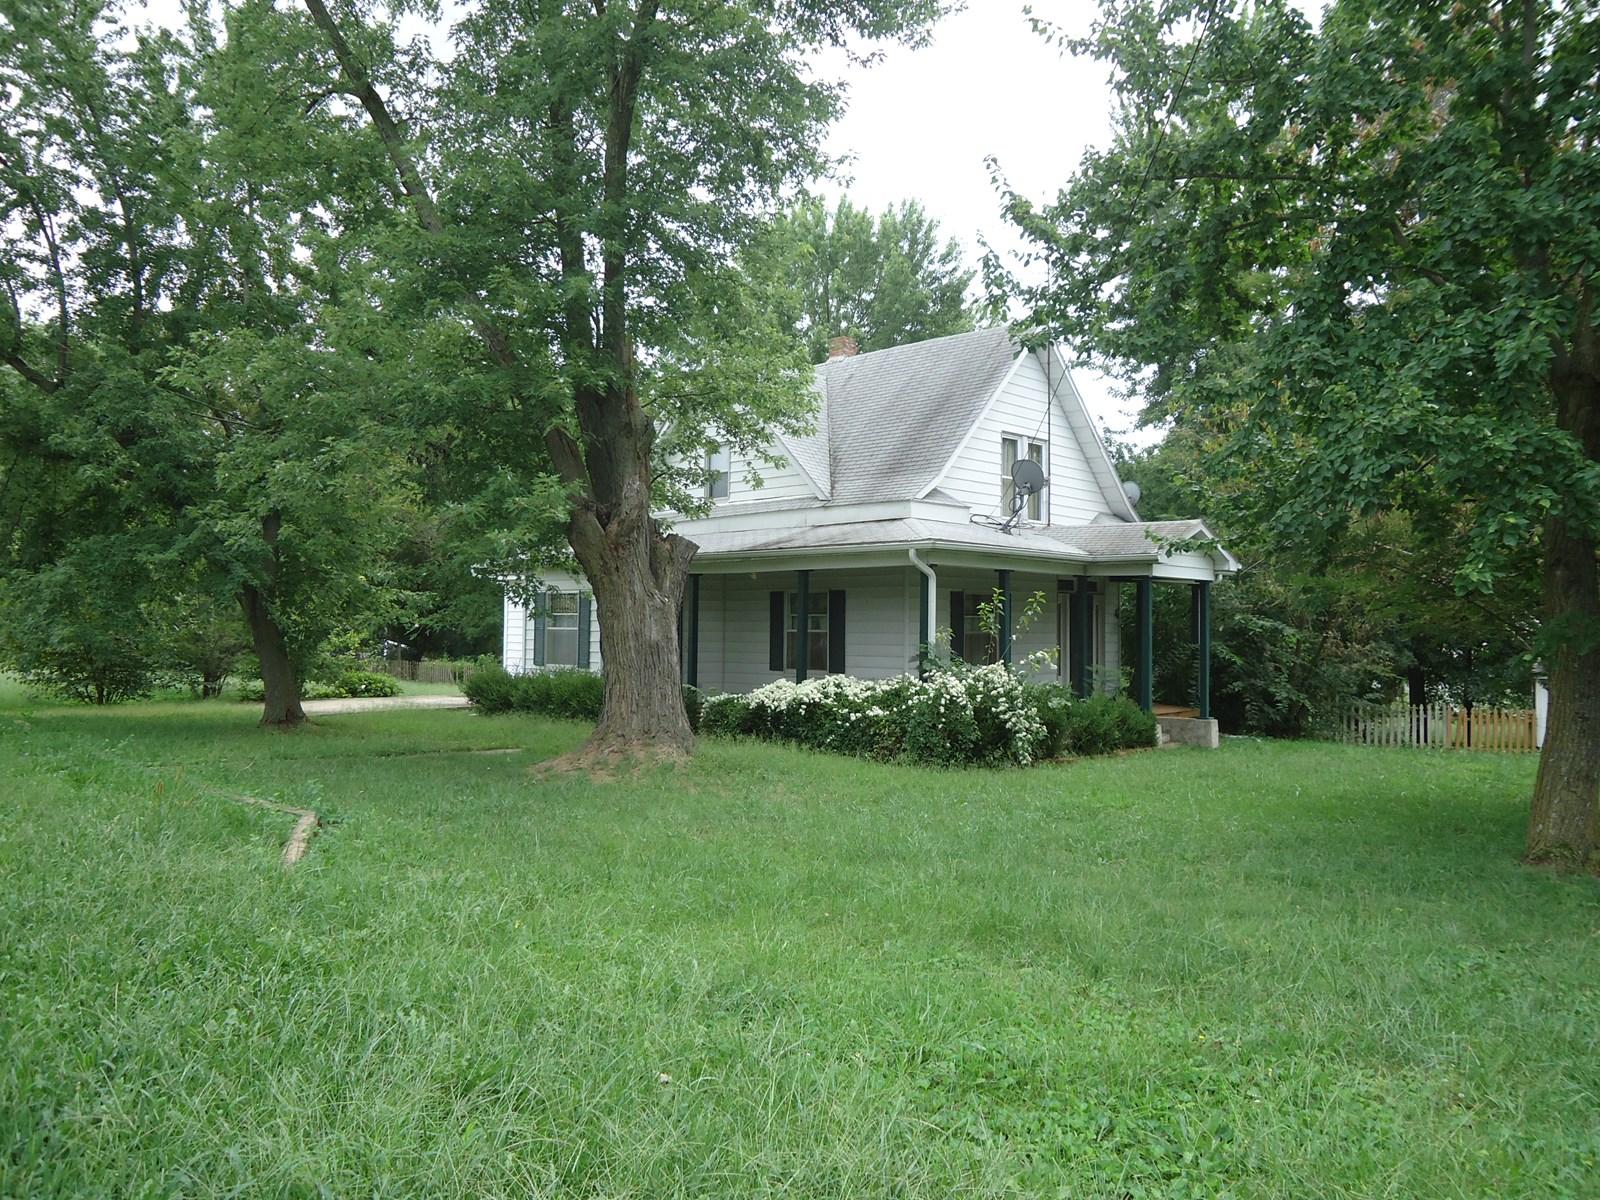 Stover Missouri Real Estate - Homes, Farms, Land